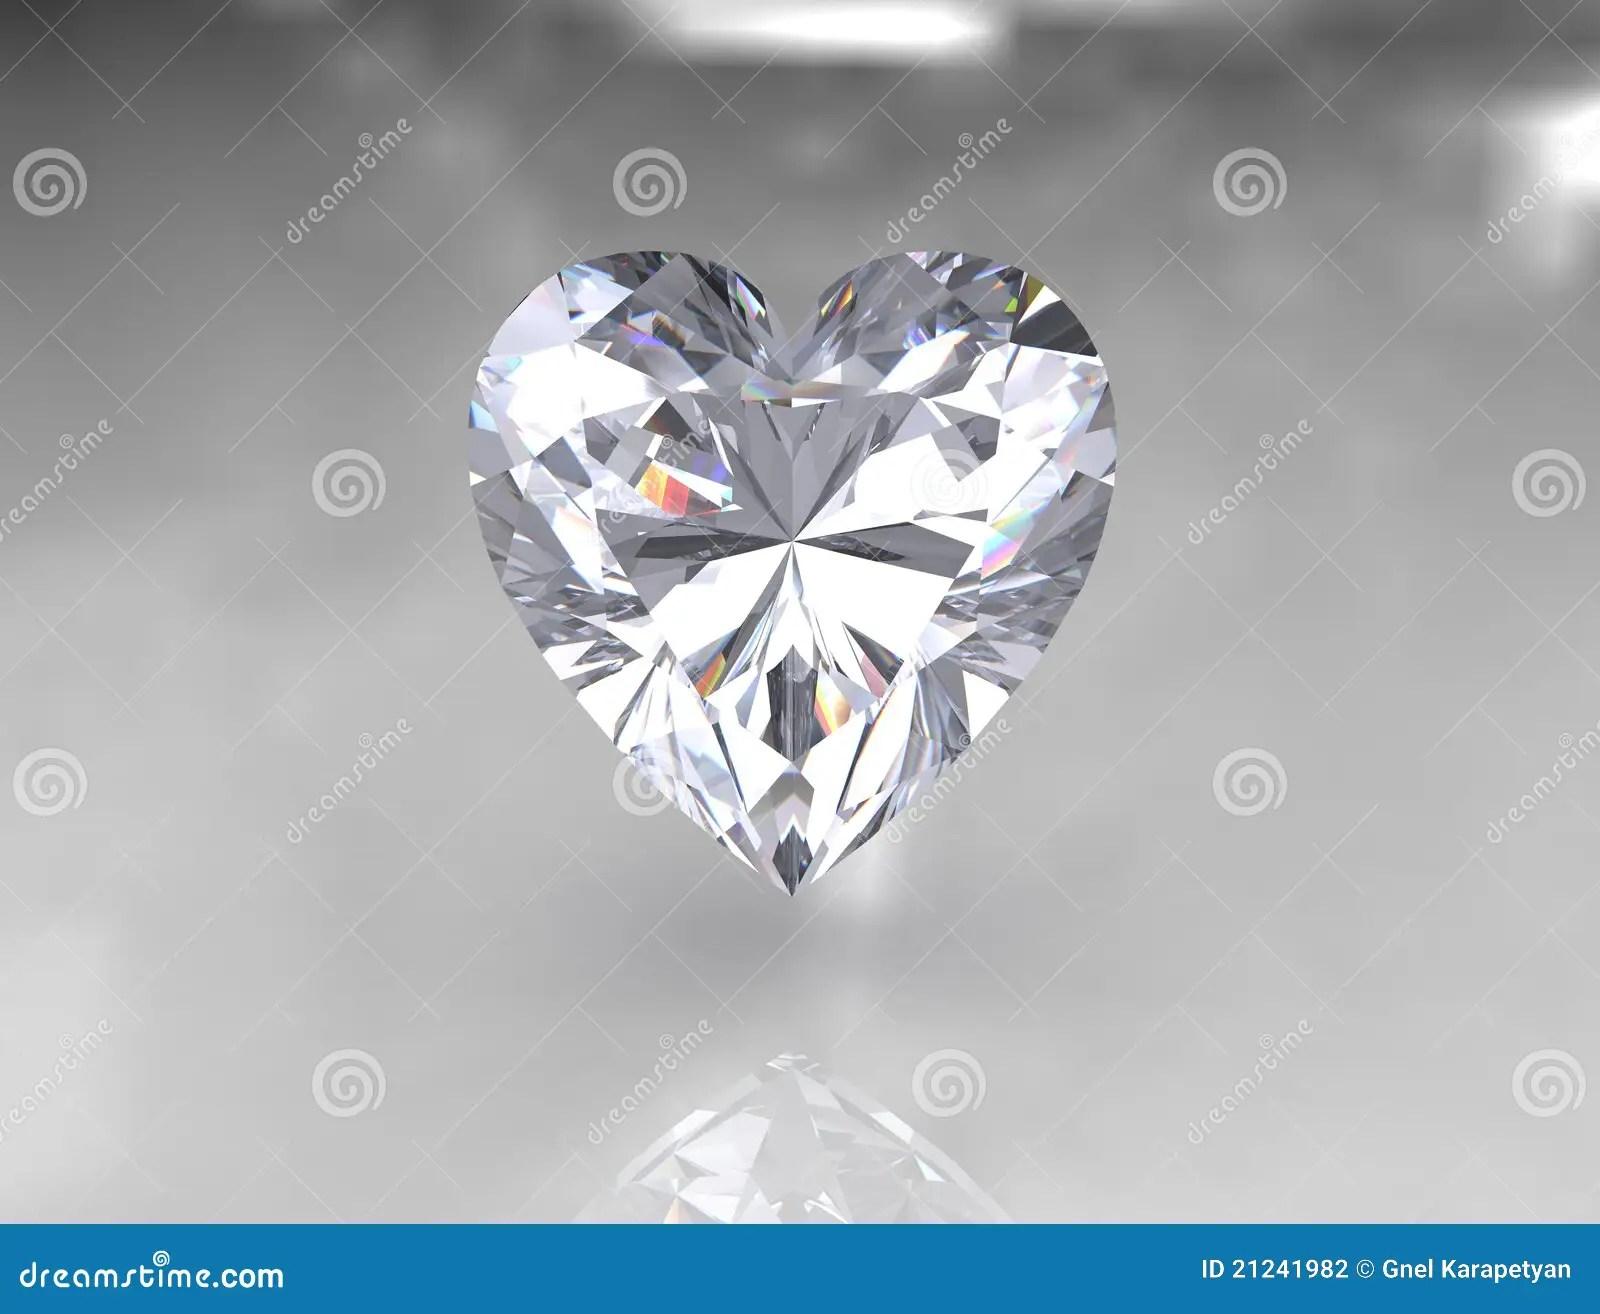 Heart Shape Brilliant White Diamond Stone Stock